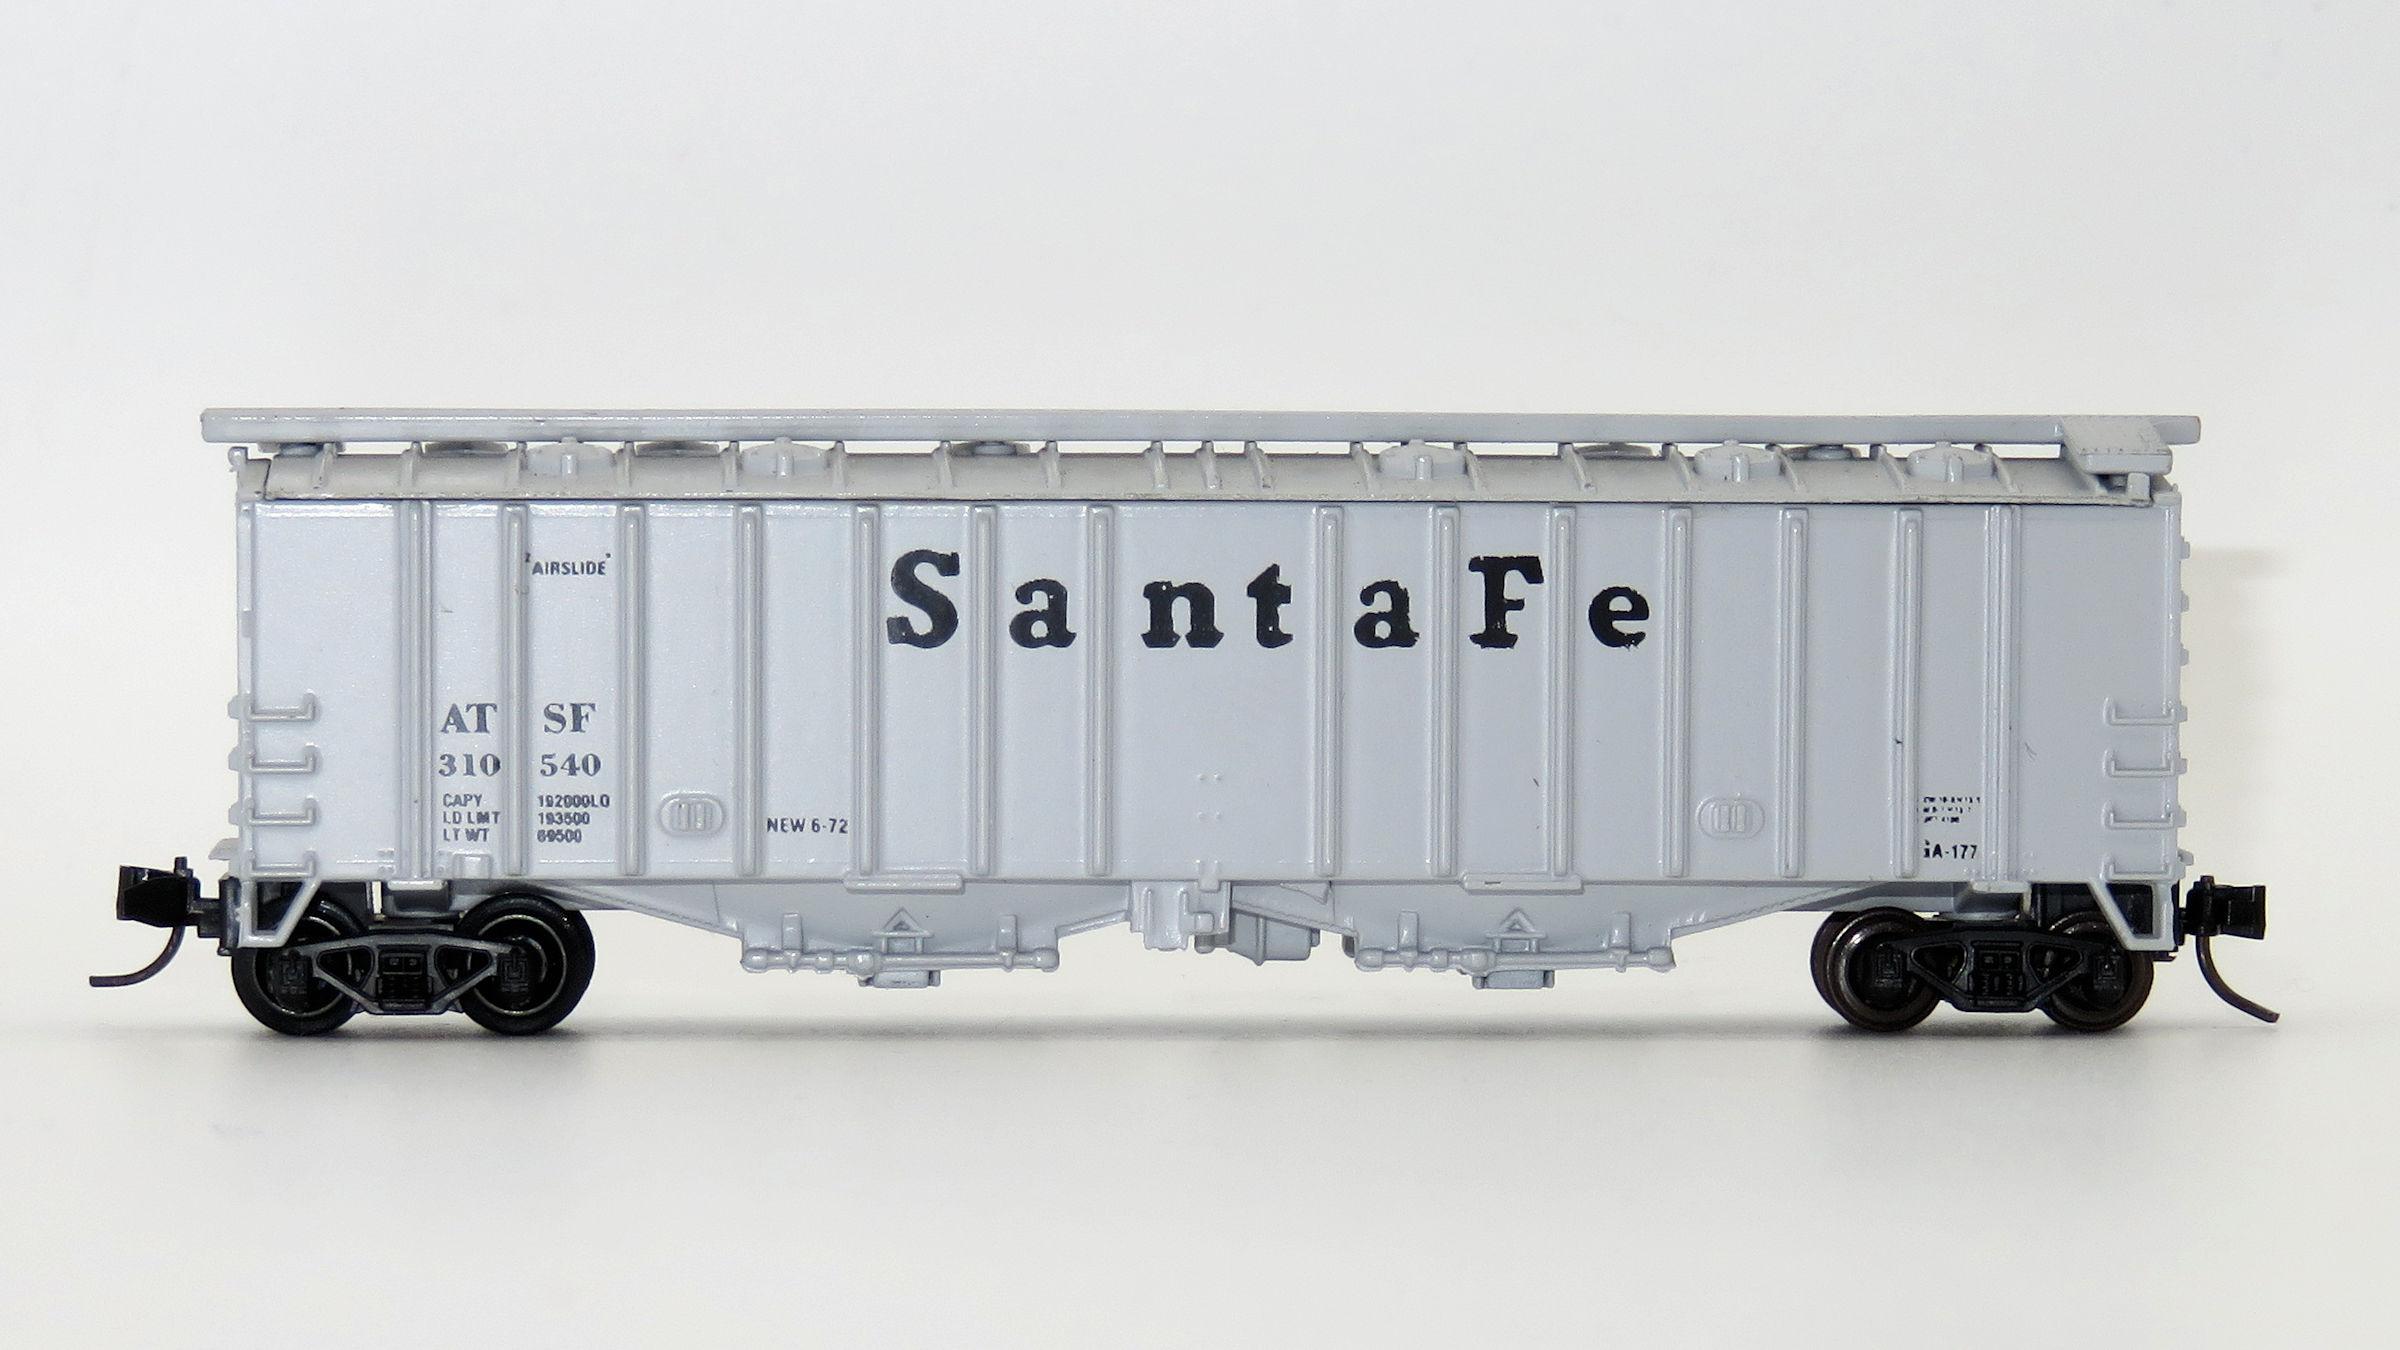 N Scale - Delaware Valley - A140 - Covered Hopper, 2-Bay, GATX Airslide 4180 - Santa Fe - 310540